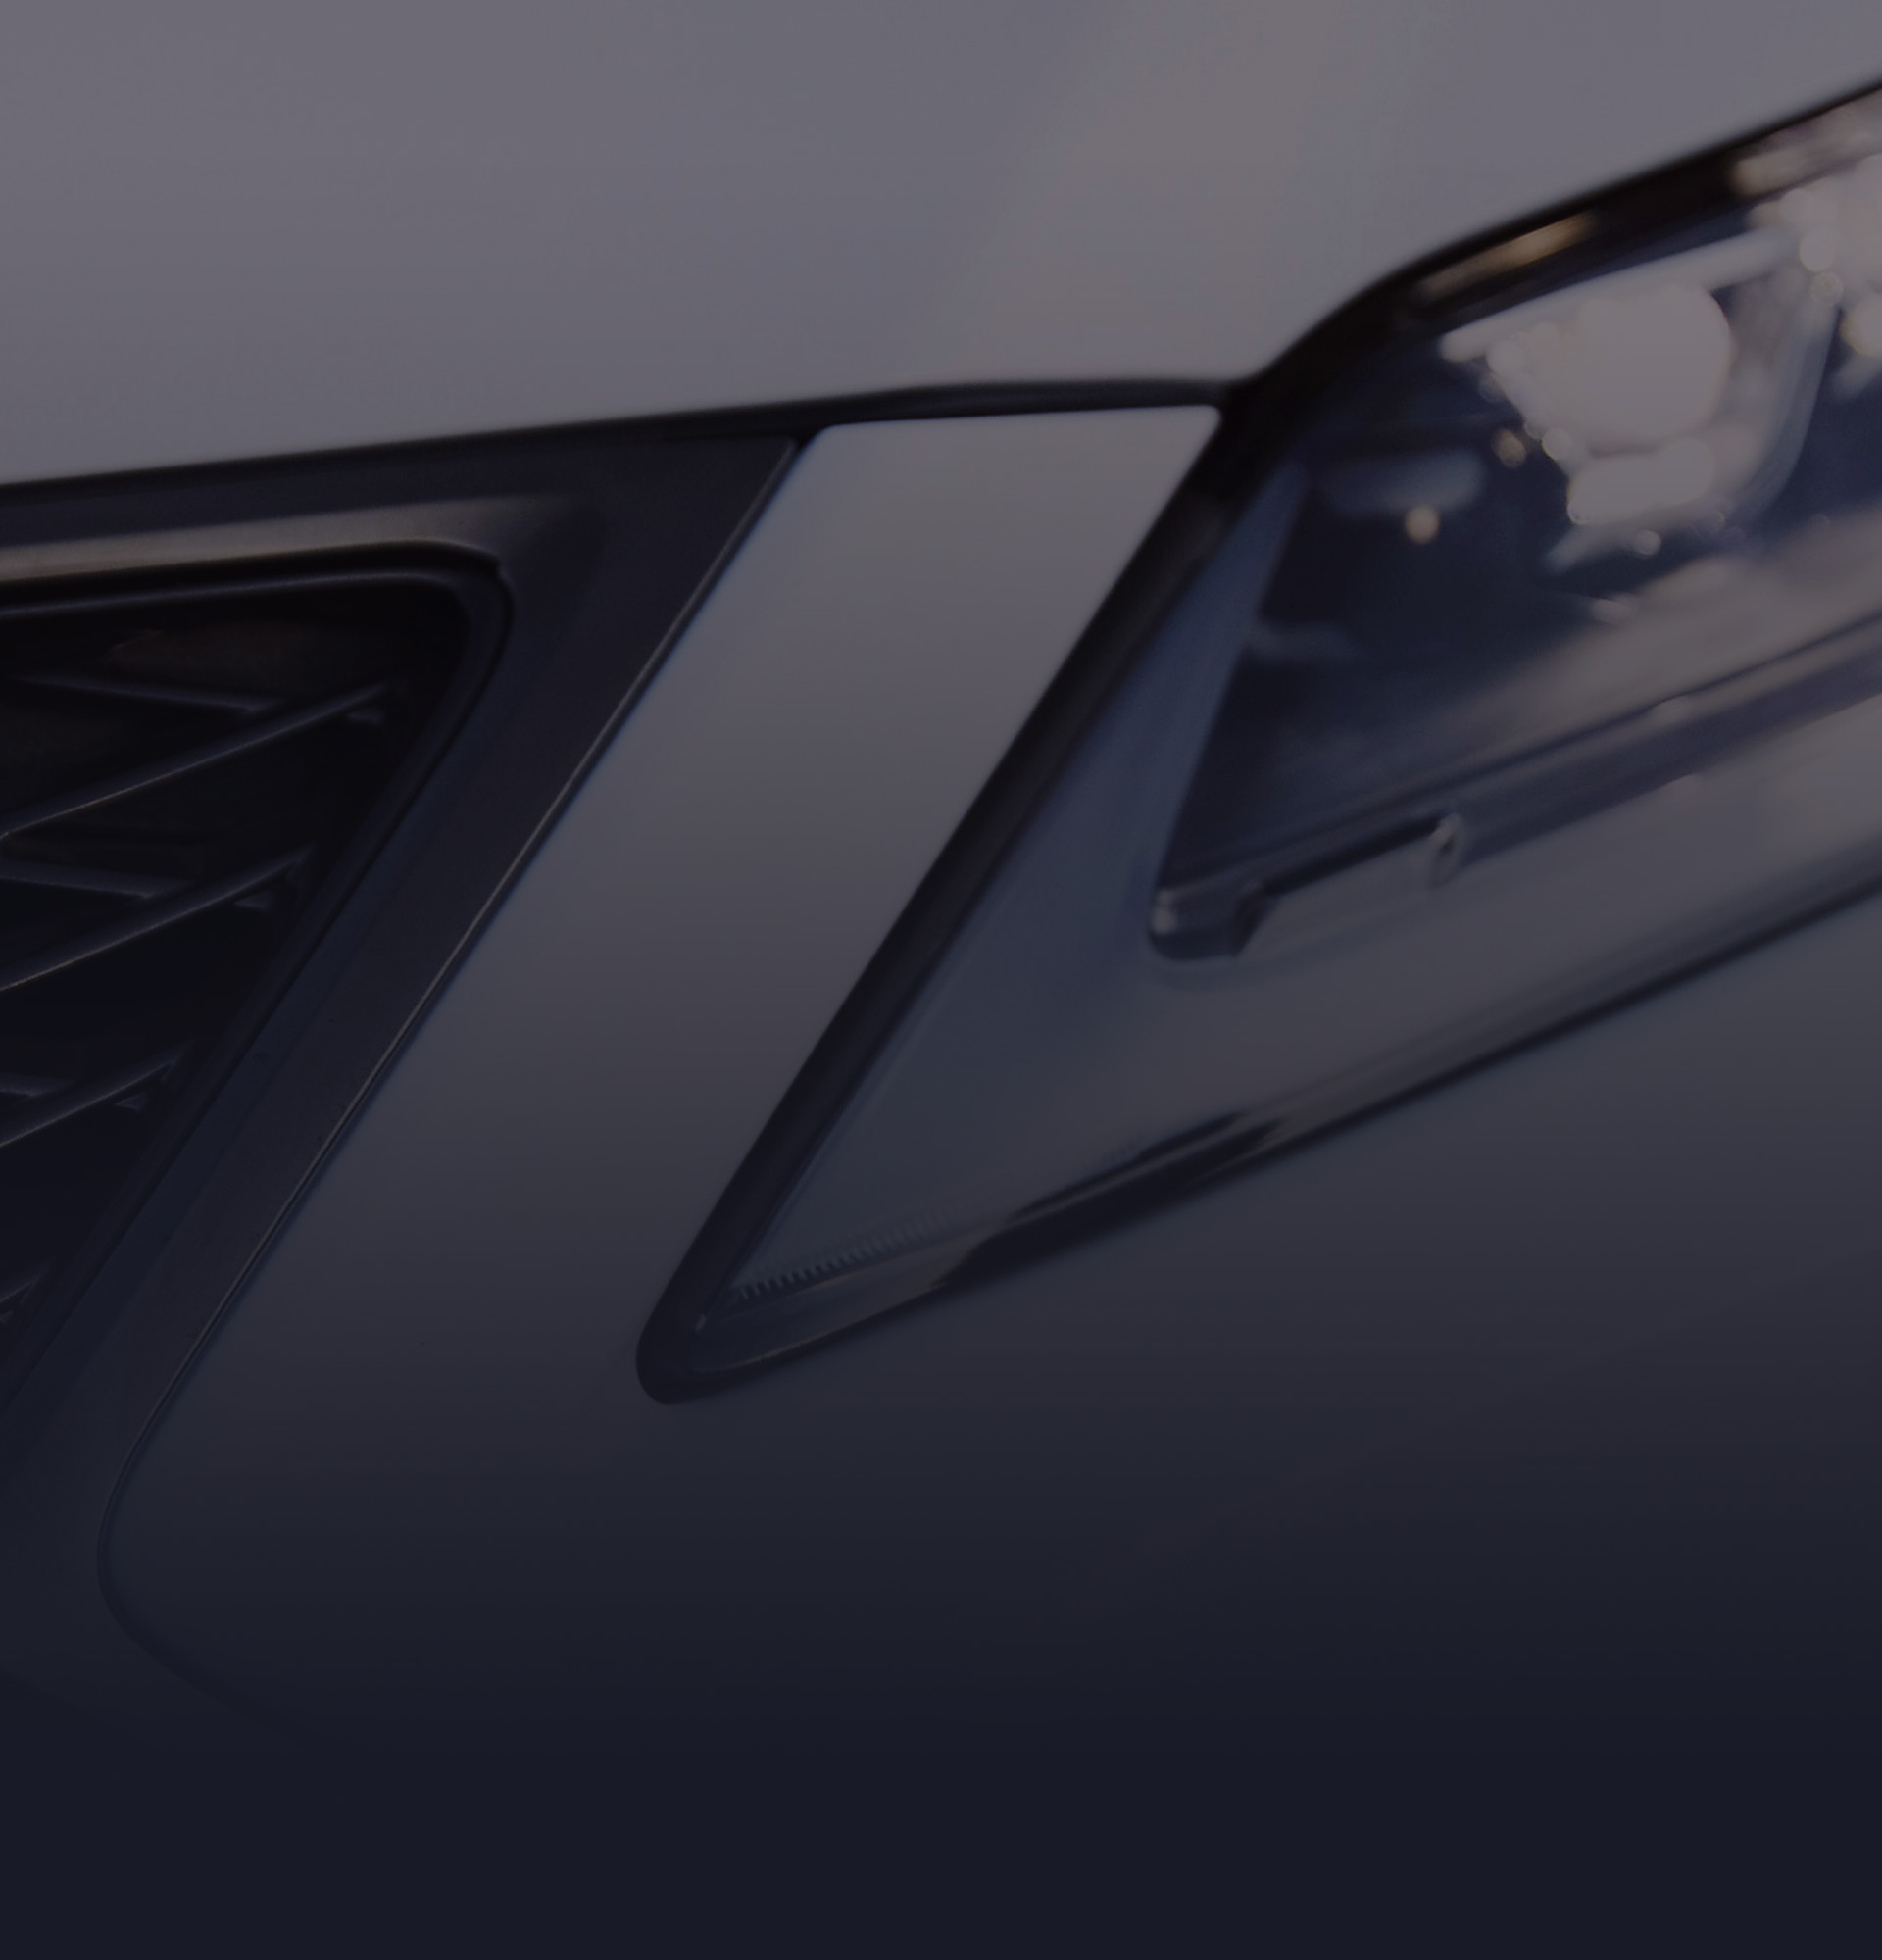 Lexus2020 SebCoeAlexHaydock Wilson Chapter2 1920x2000 BG